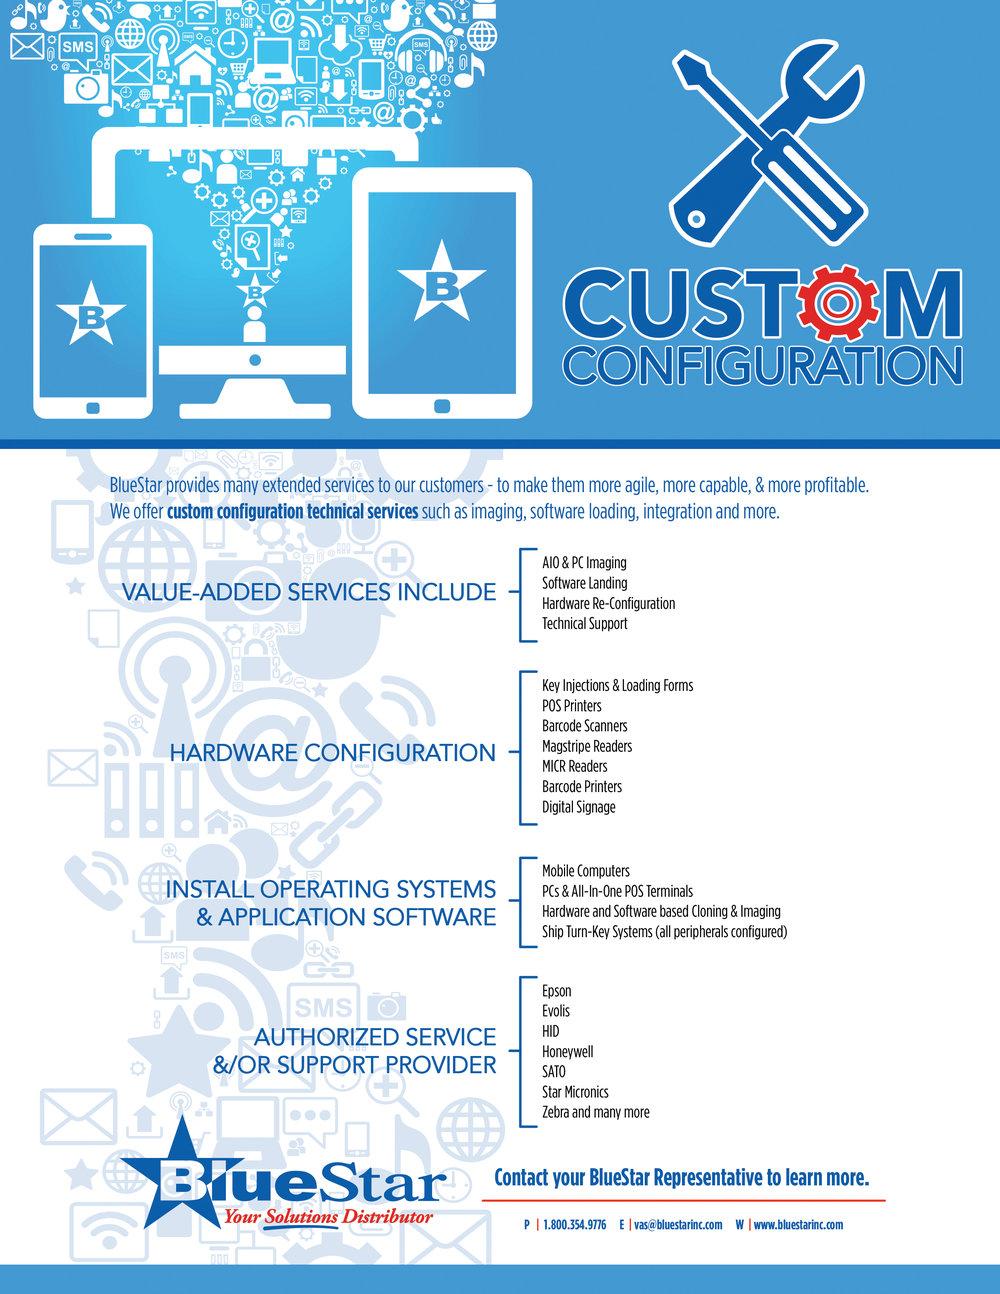 BlueStar Custom Configuration 2016